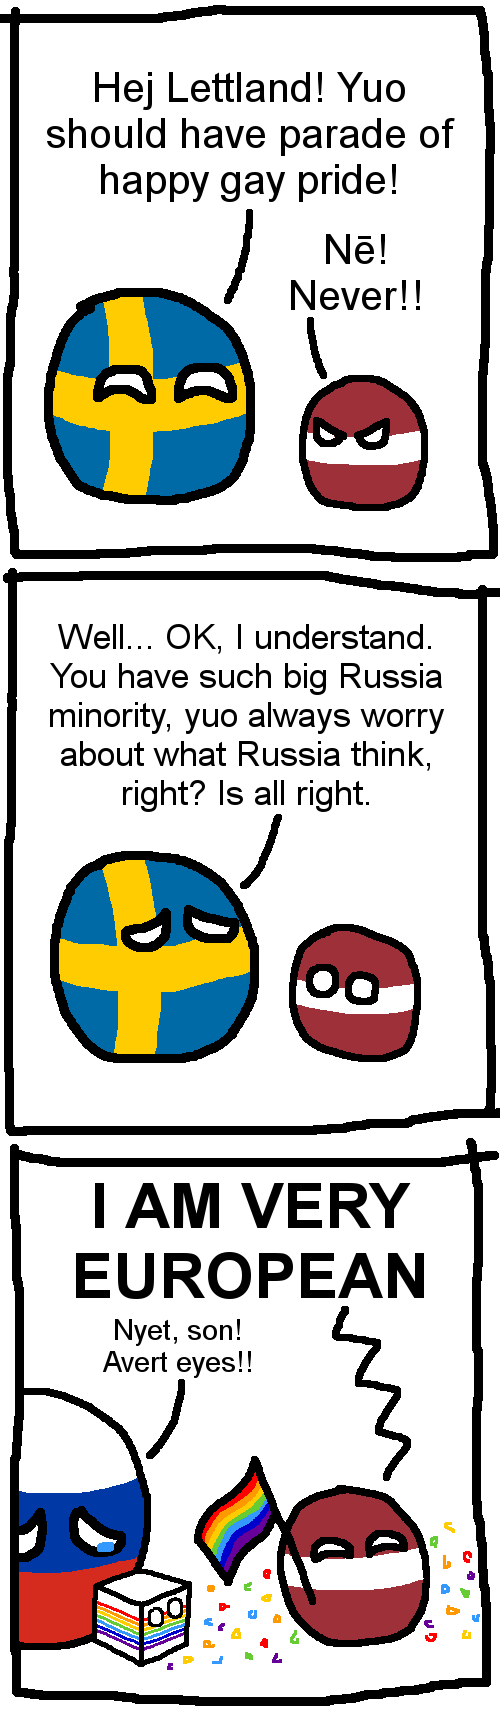 Latvia considers Russia's needs